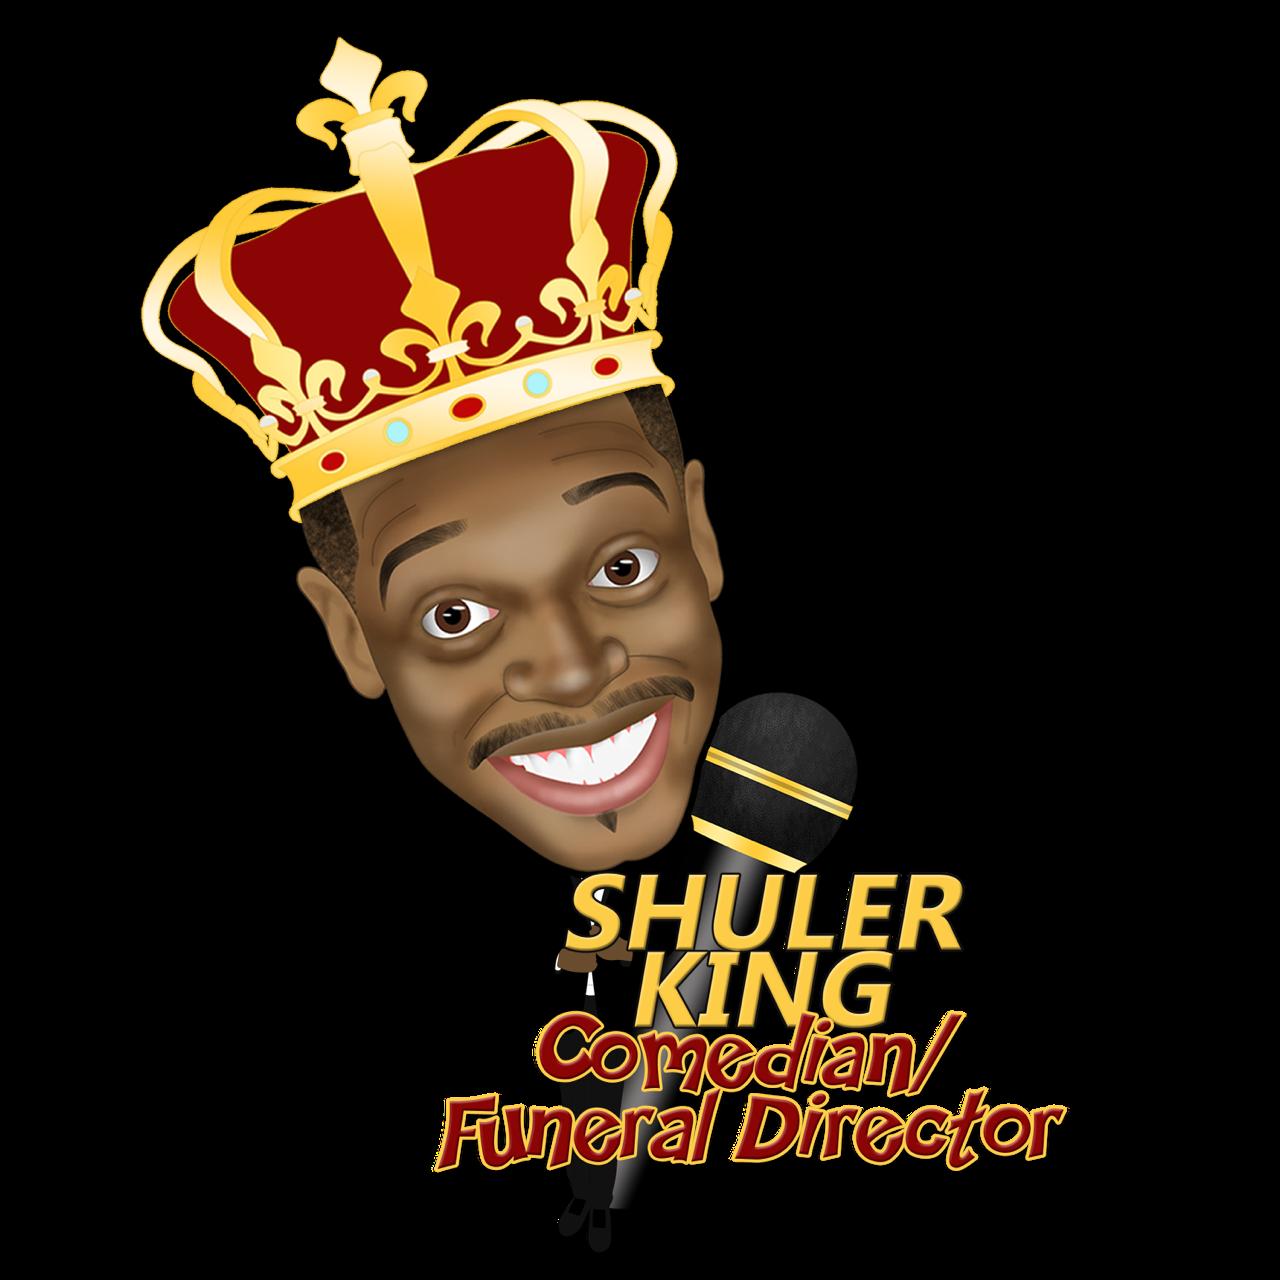 About Shuler King / Comedain Funeral Home Director /shulerking com